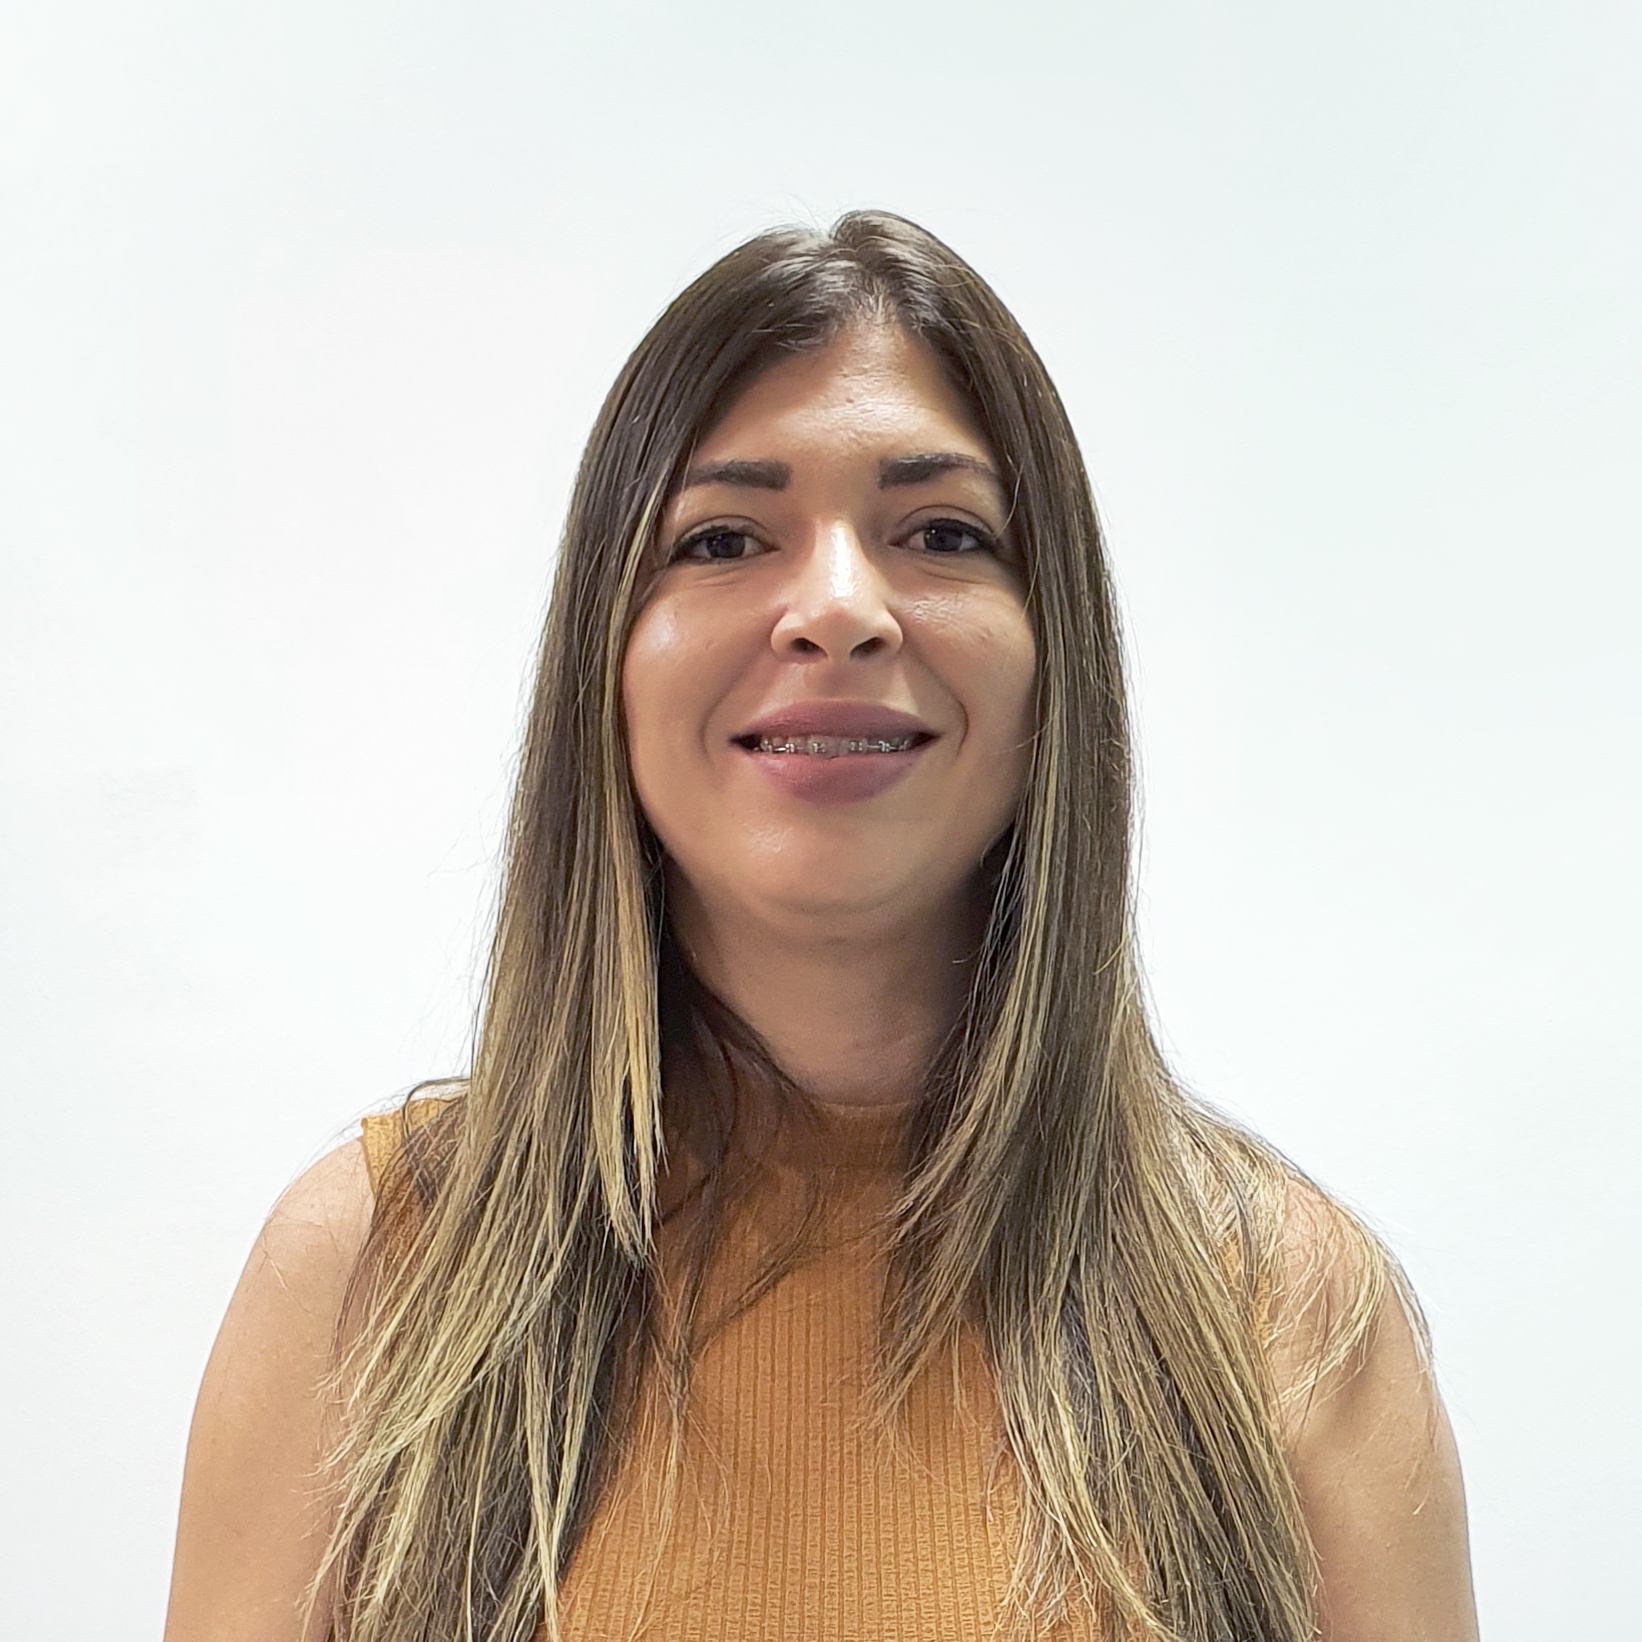 Luciana Cavalcanti